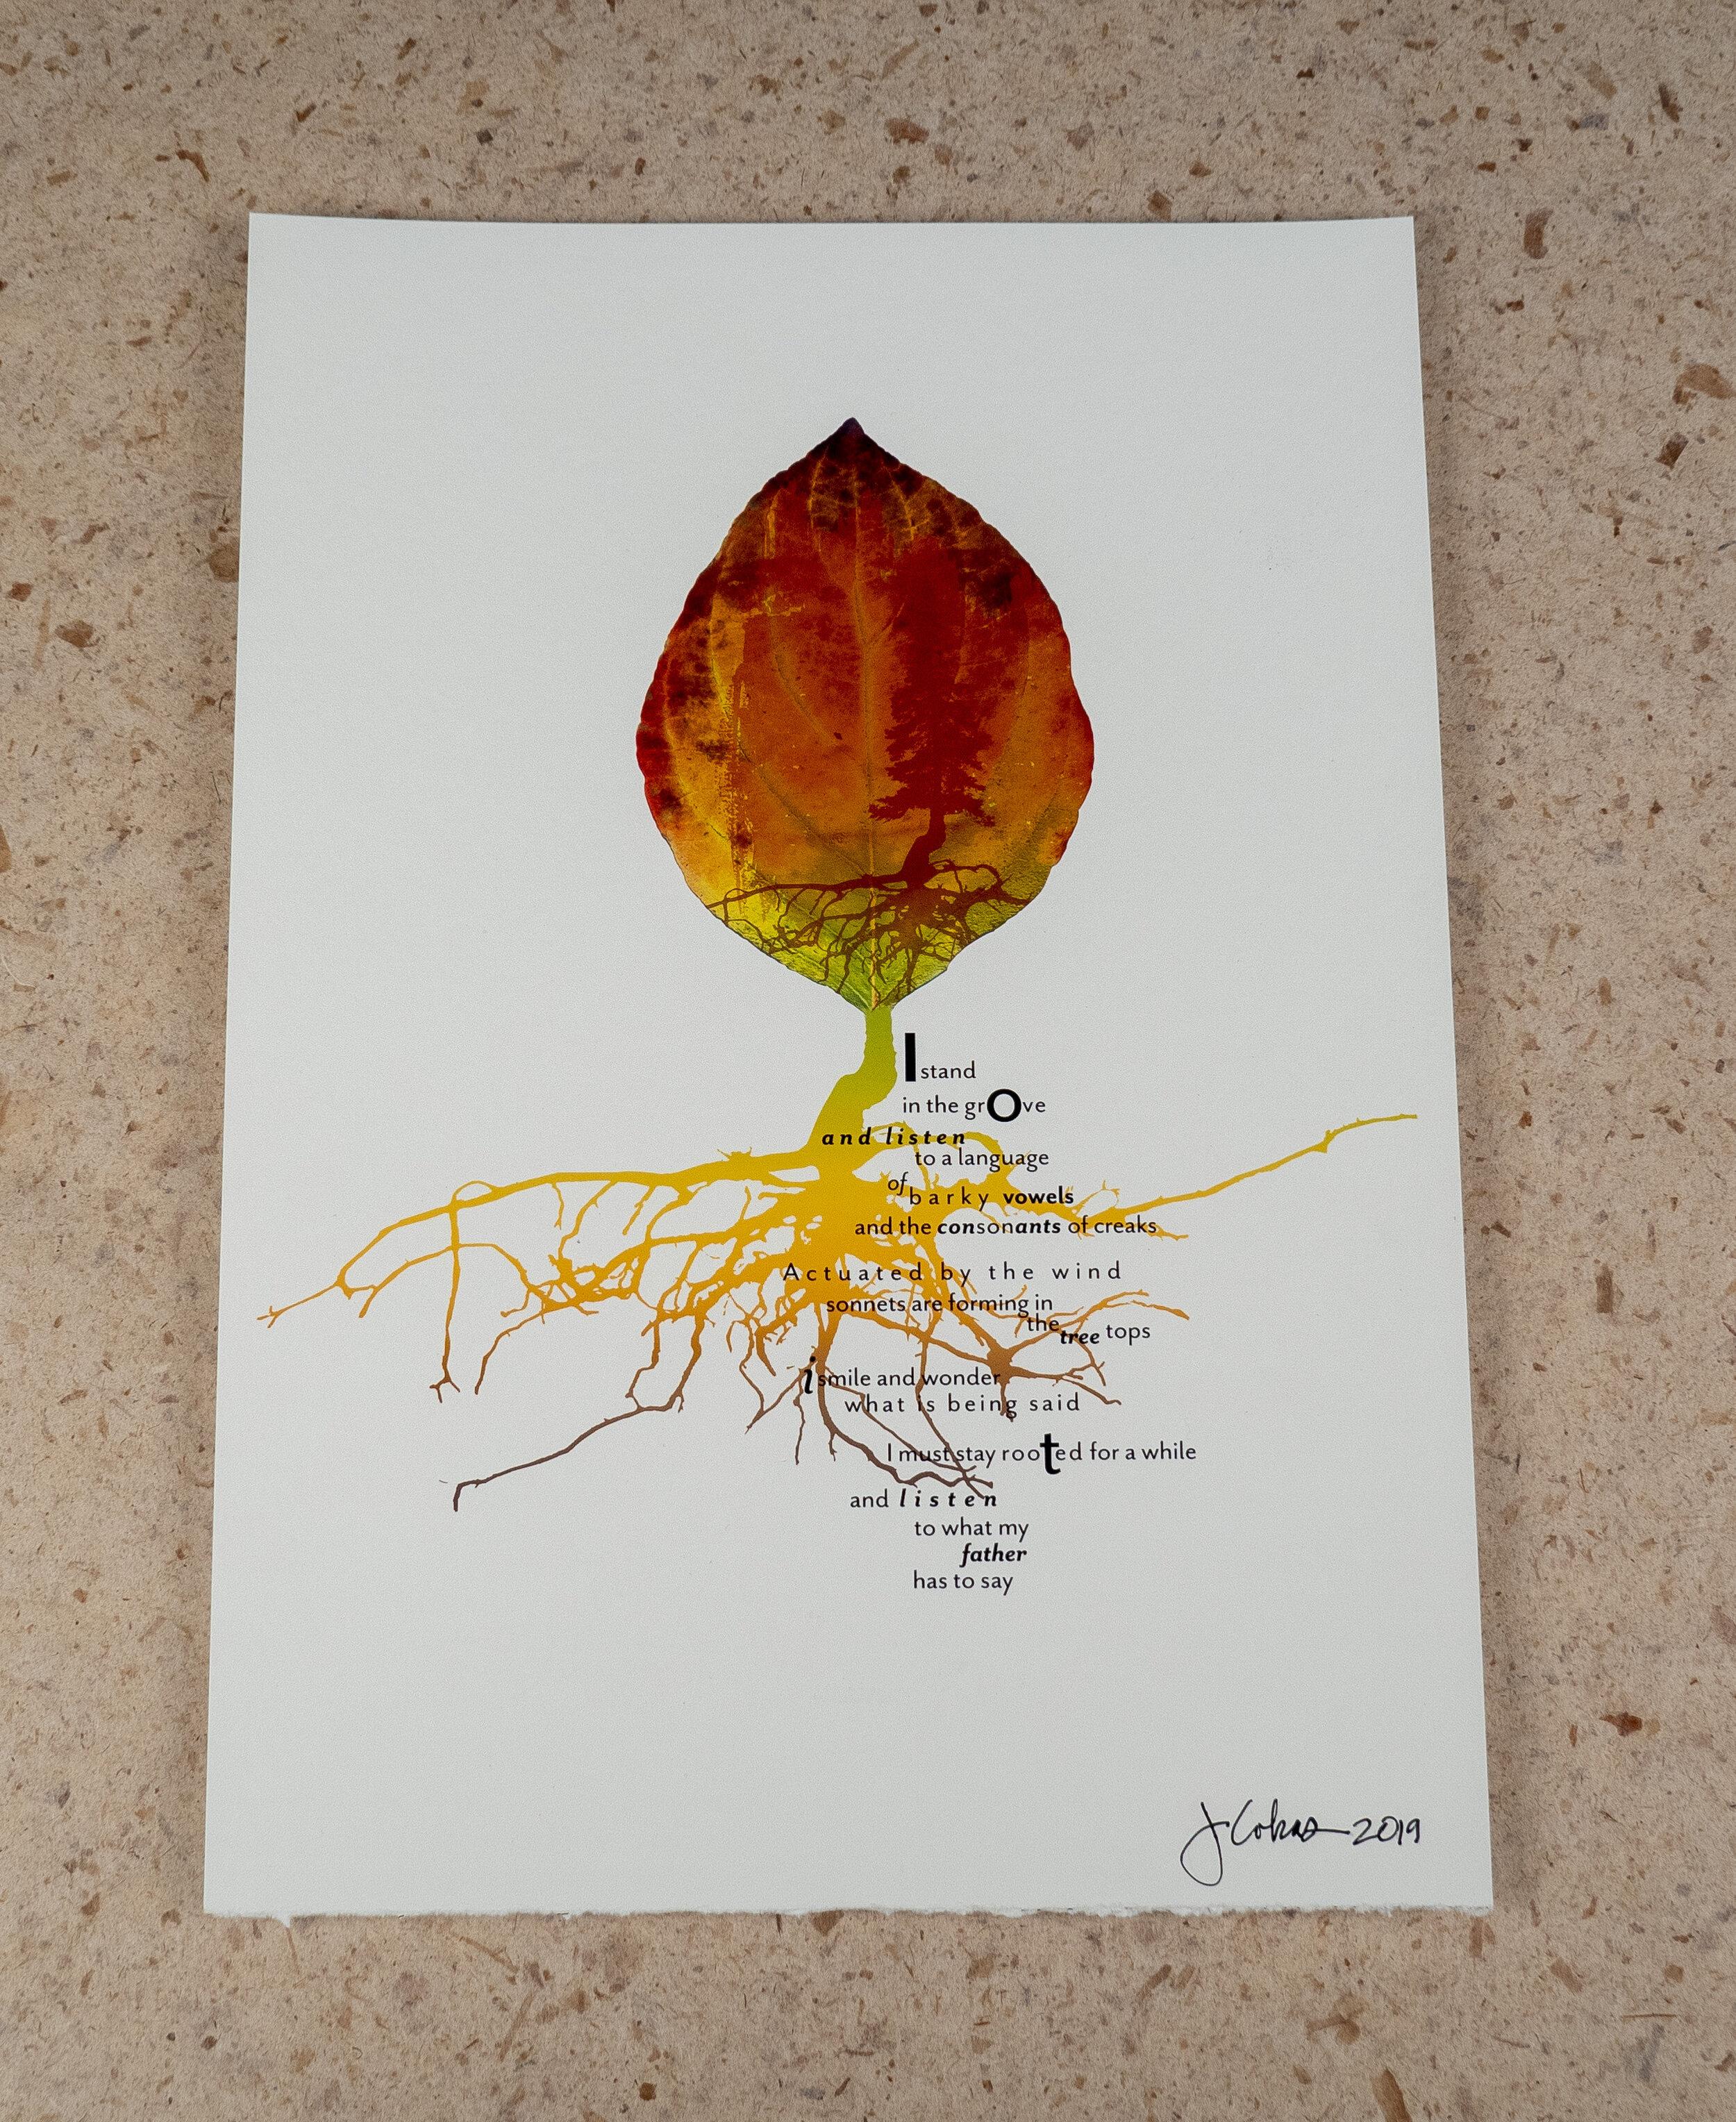 Grove-1_Print Photo.jpg